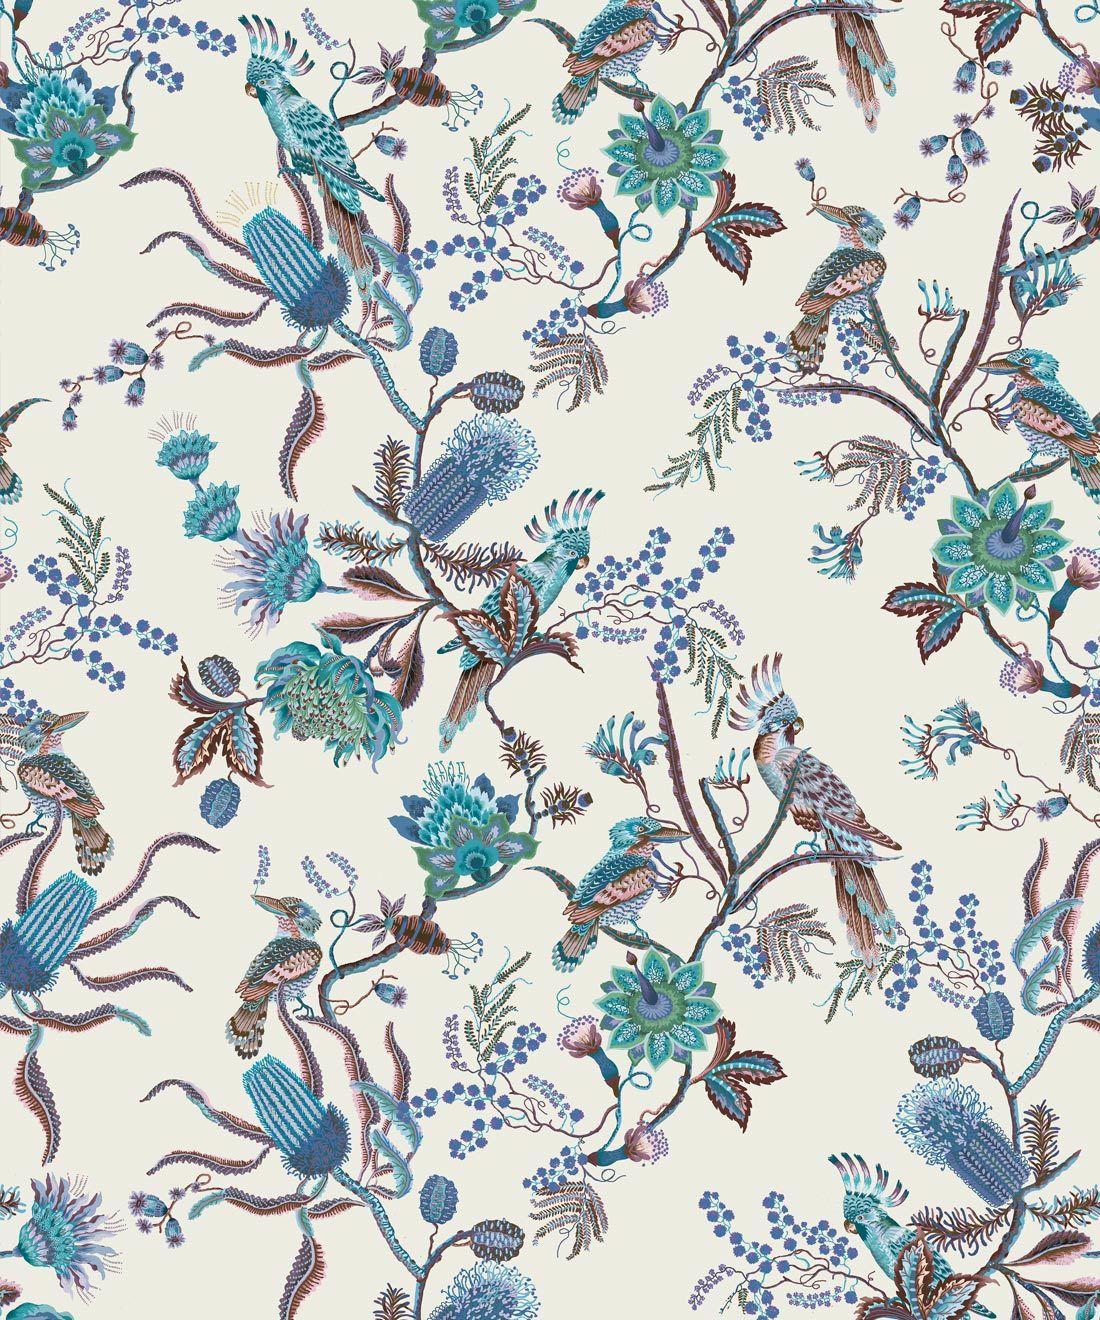 Matilda Wallpaper • Cockatoo, kookaburra • Australian Wallpaper • Milton & King USA • Blue Bell Swatch